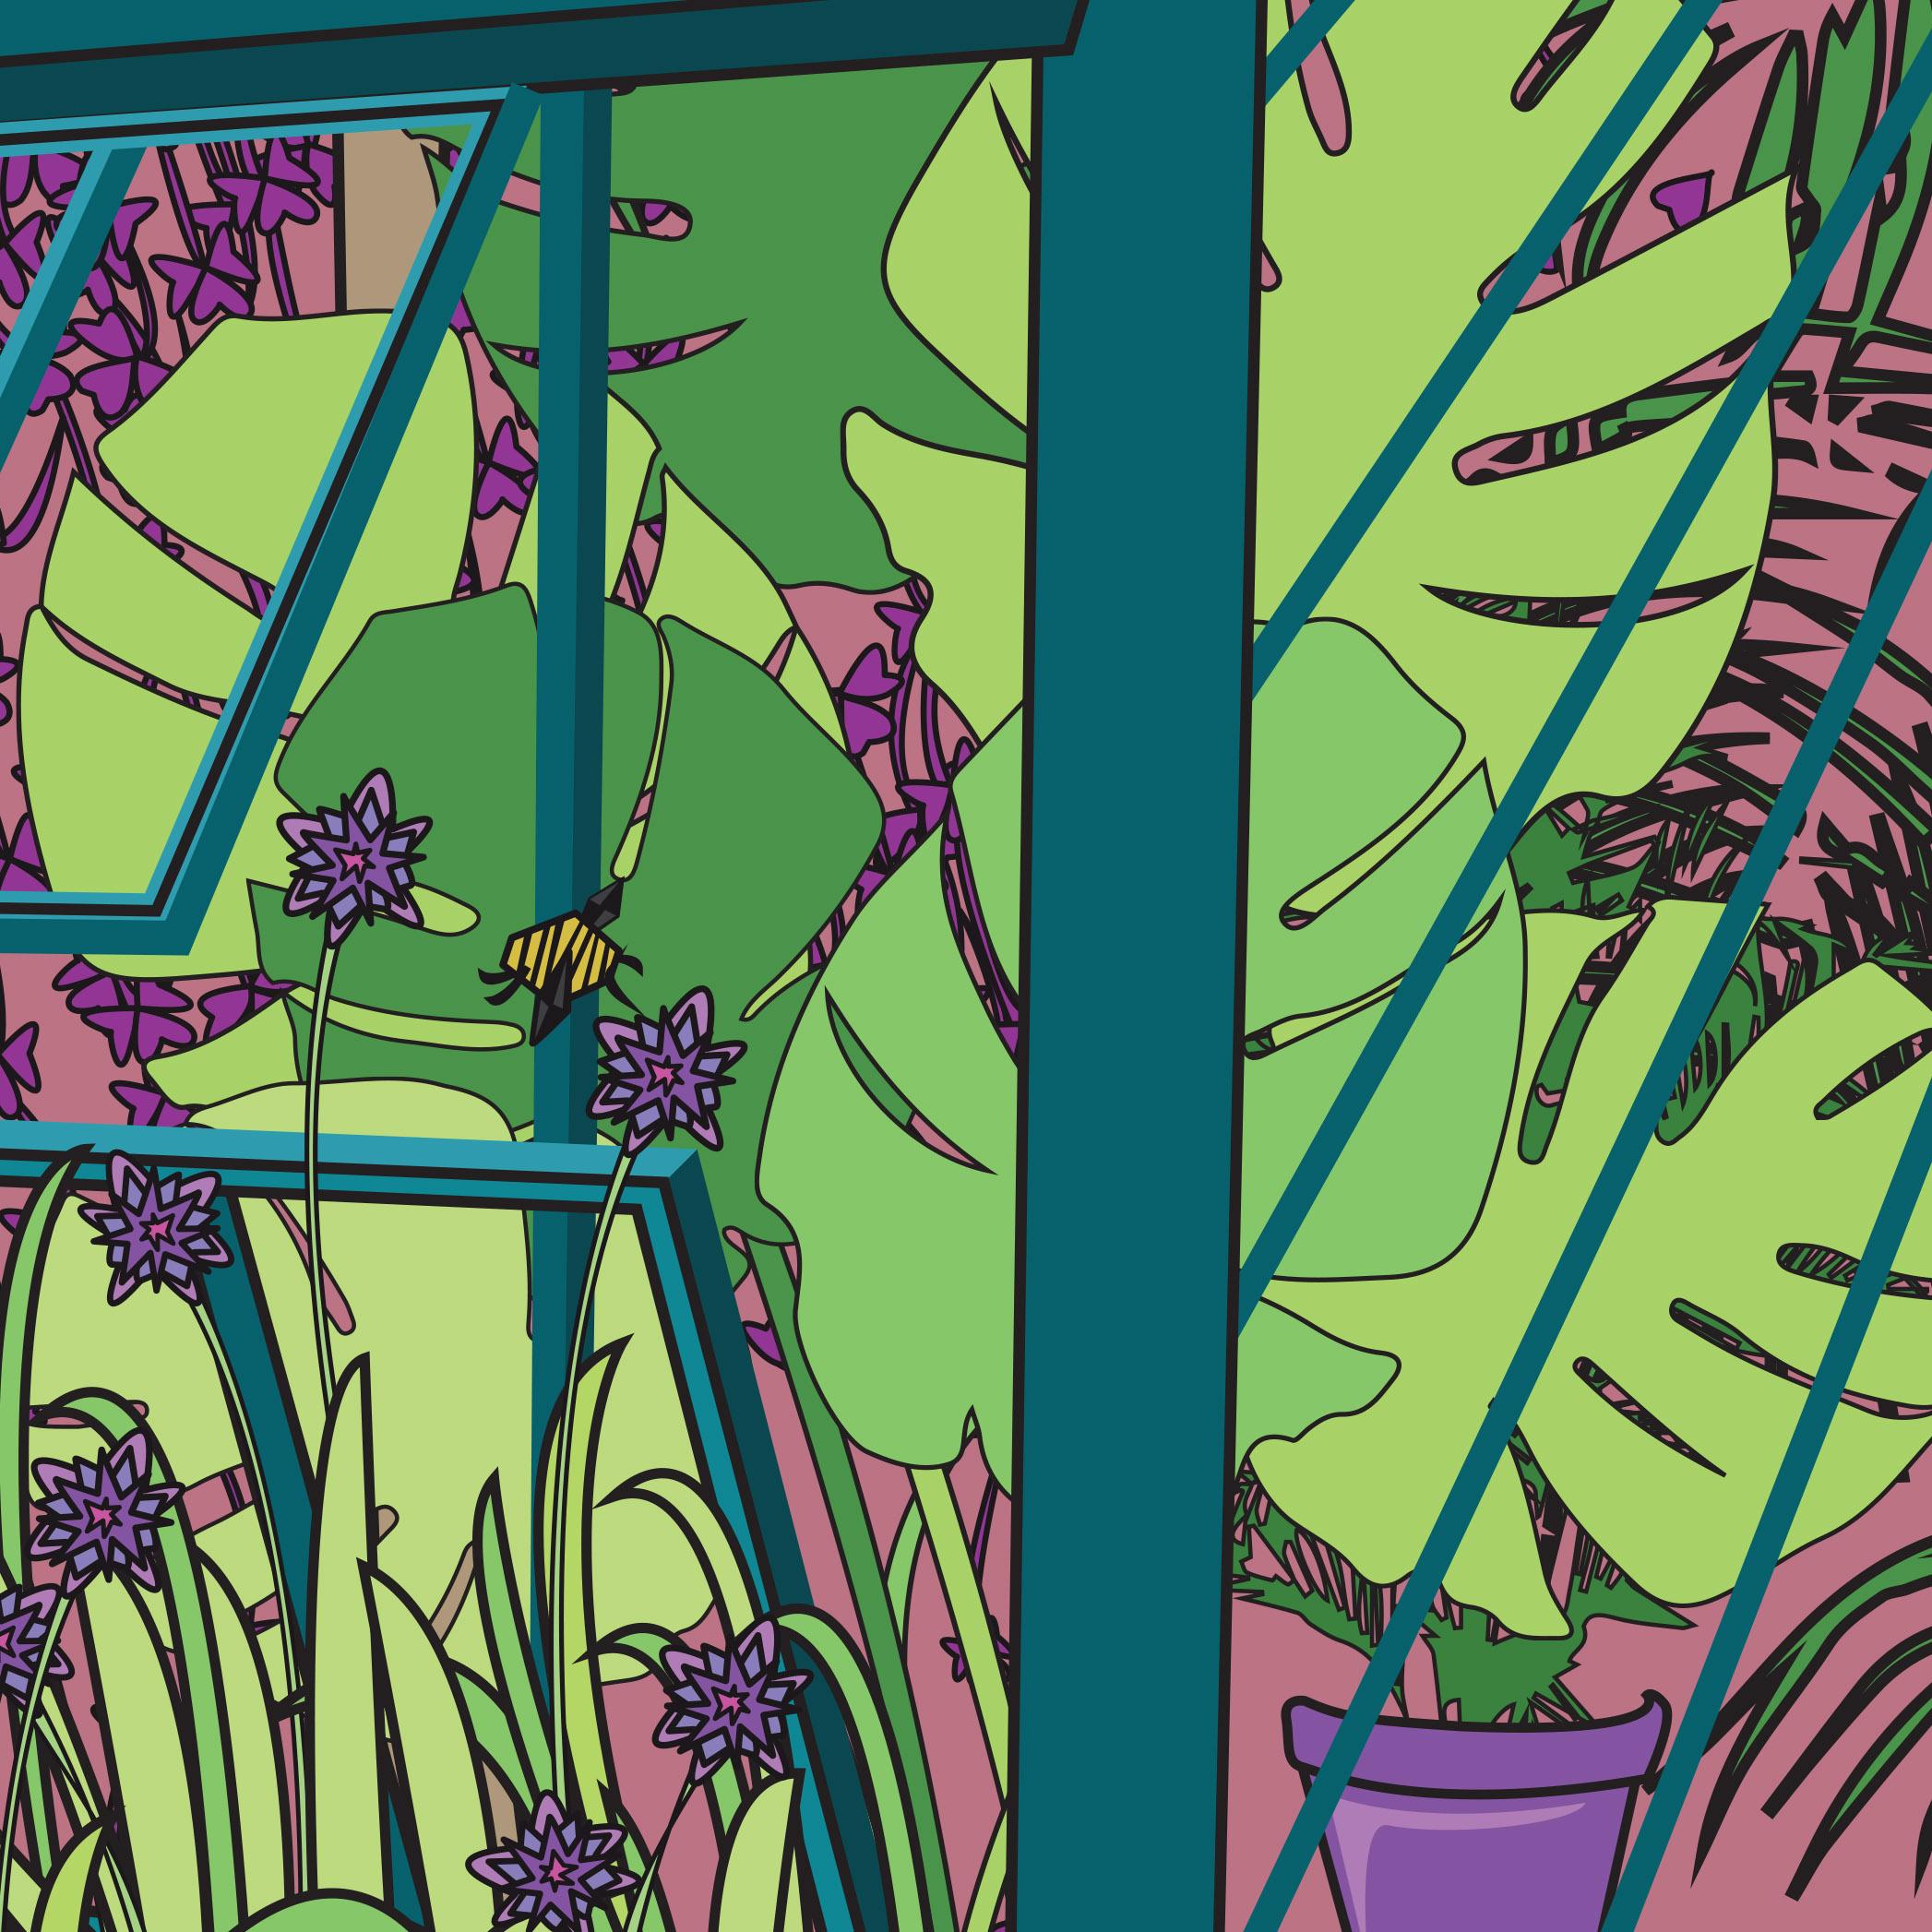 green-tropical-foliage-illustration